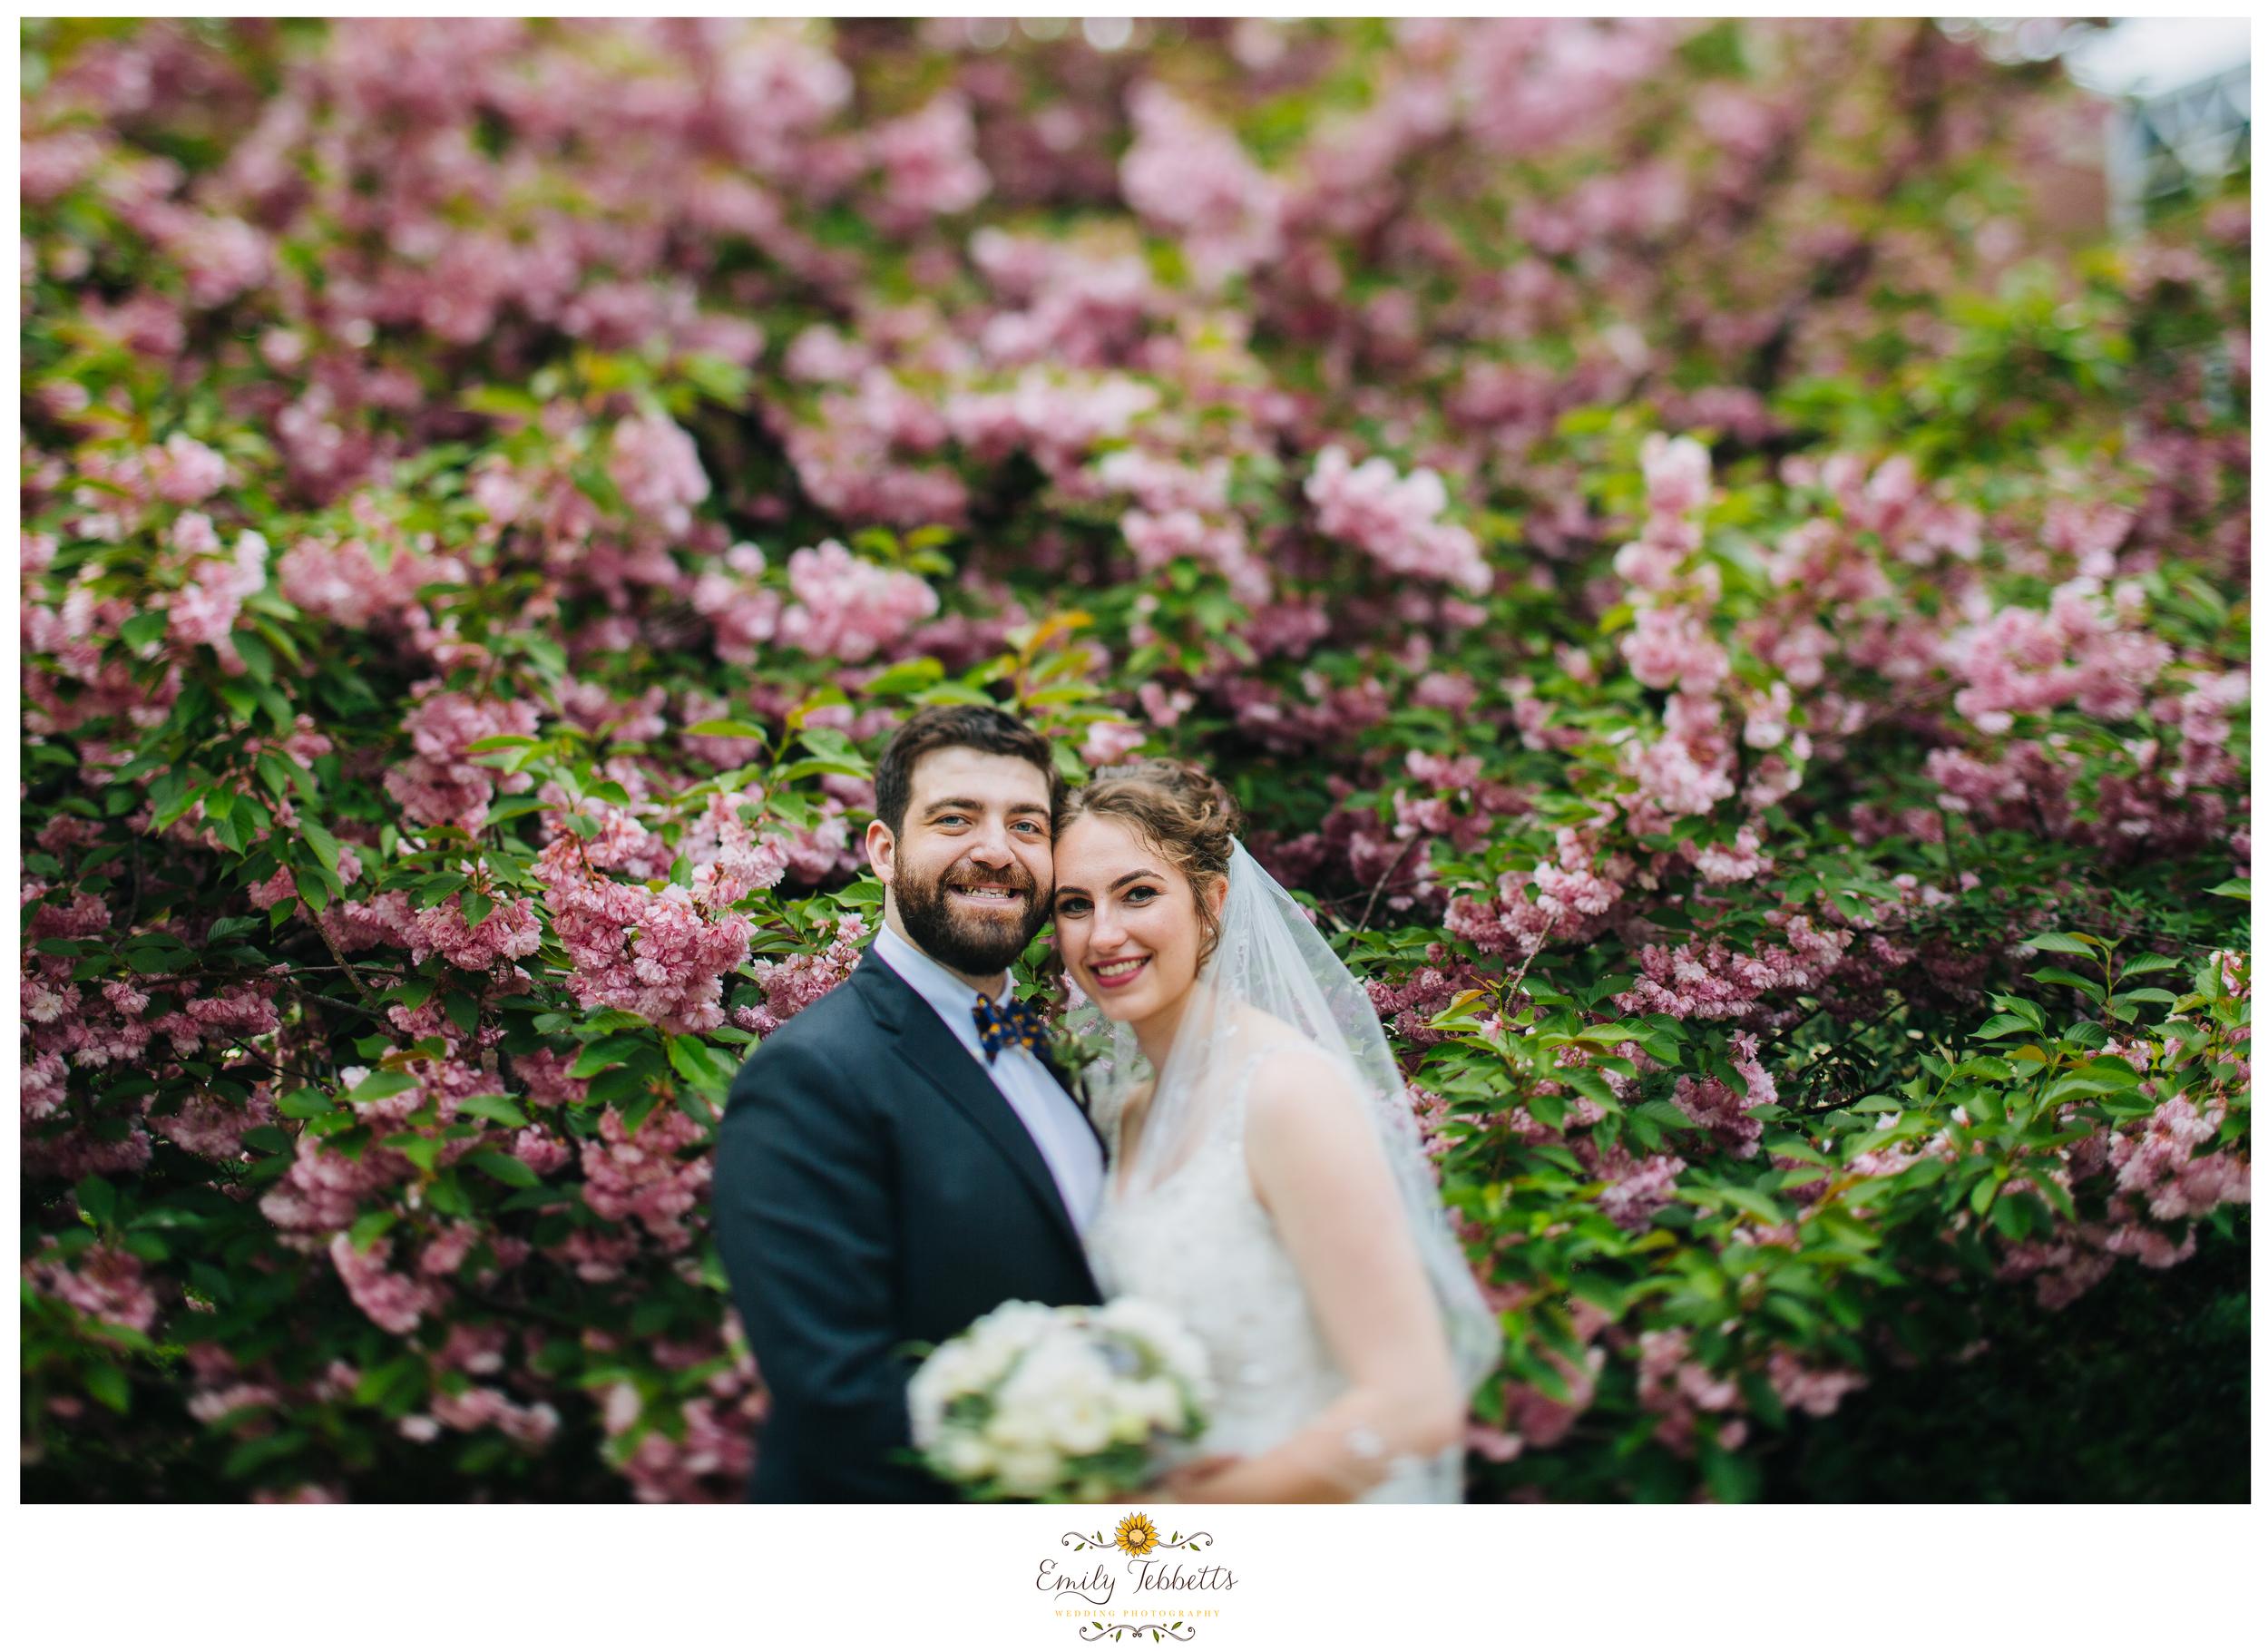 Emily Tebbetts Photography Backyard wedding madison NJ new jersey new england intimate elopement